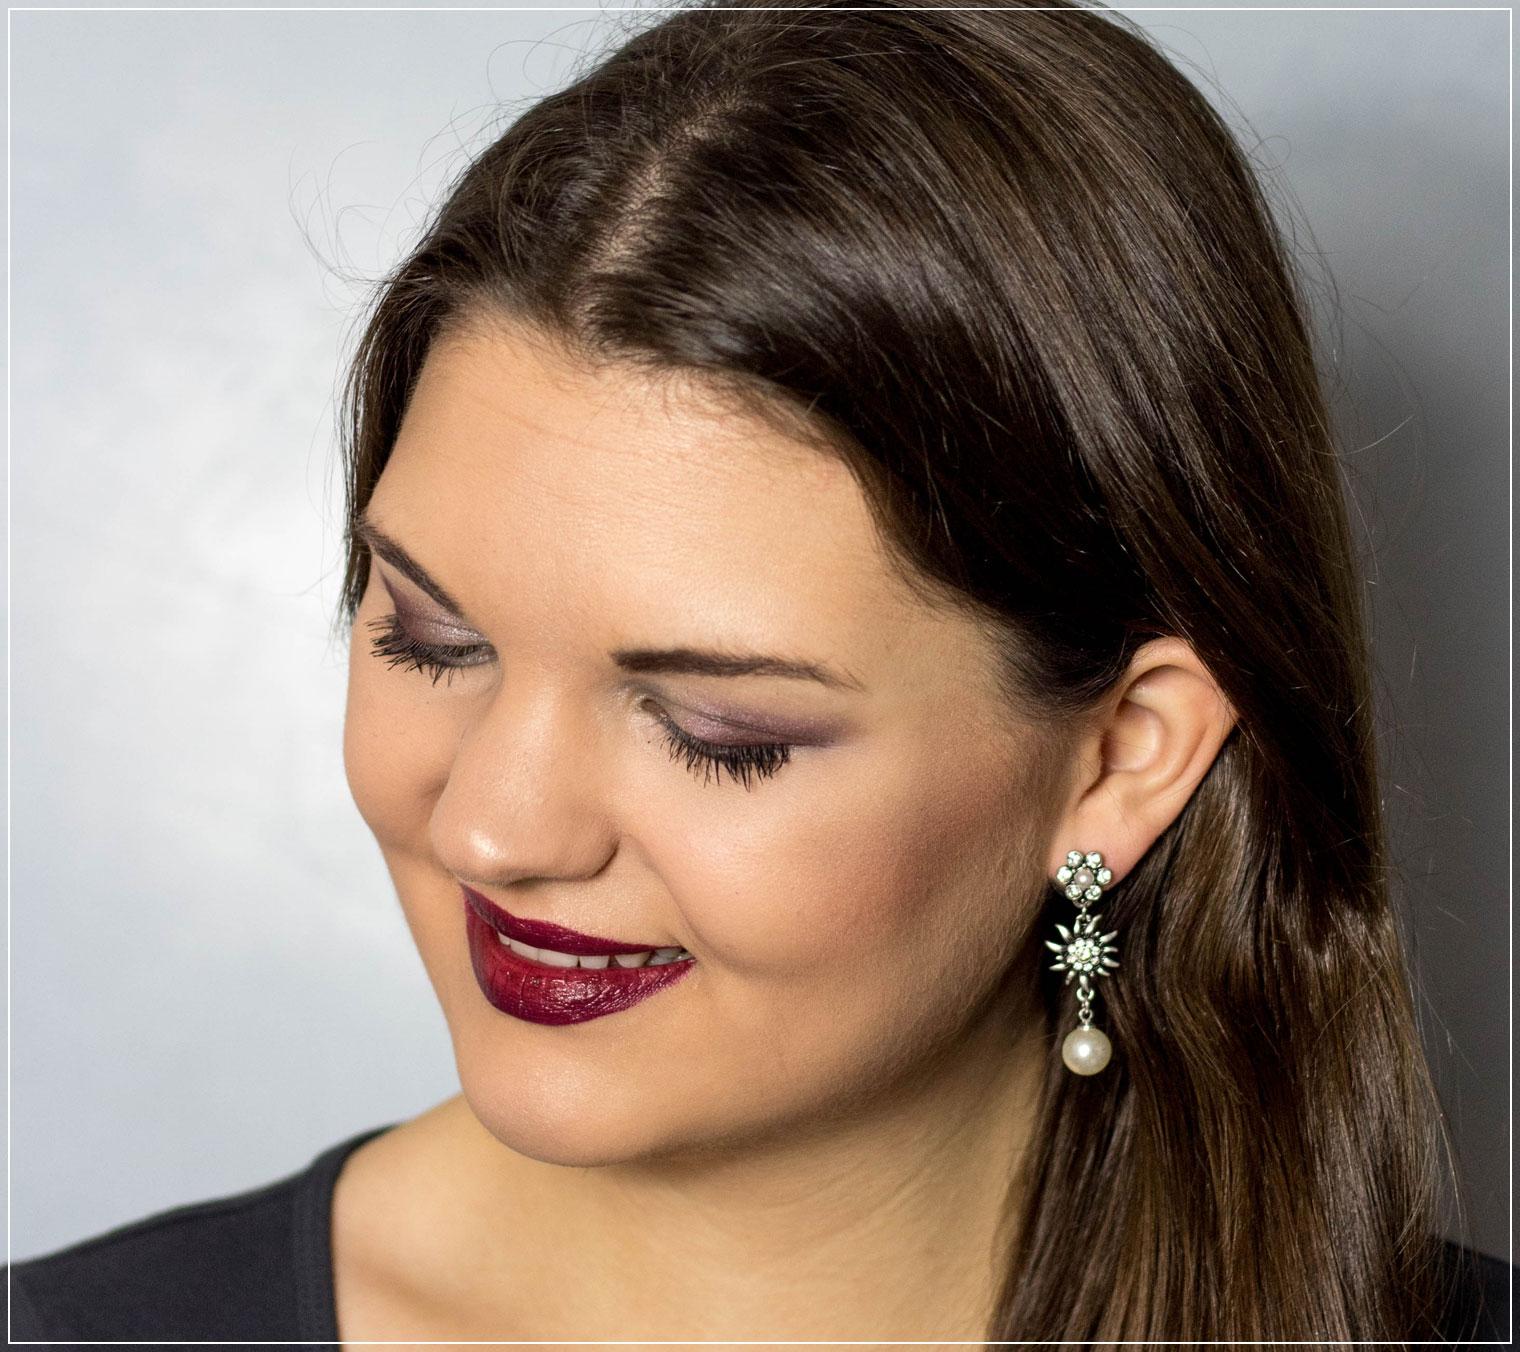 Winter Make-Up, Make-Up Tutorial, festliches Make-Up, Weihnachtsmakeup, Holiday Season, Festive Season